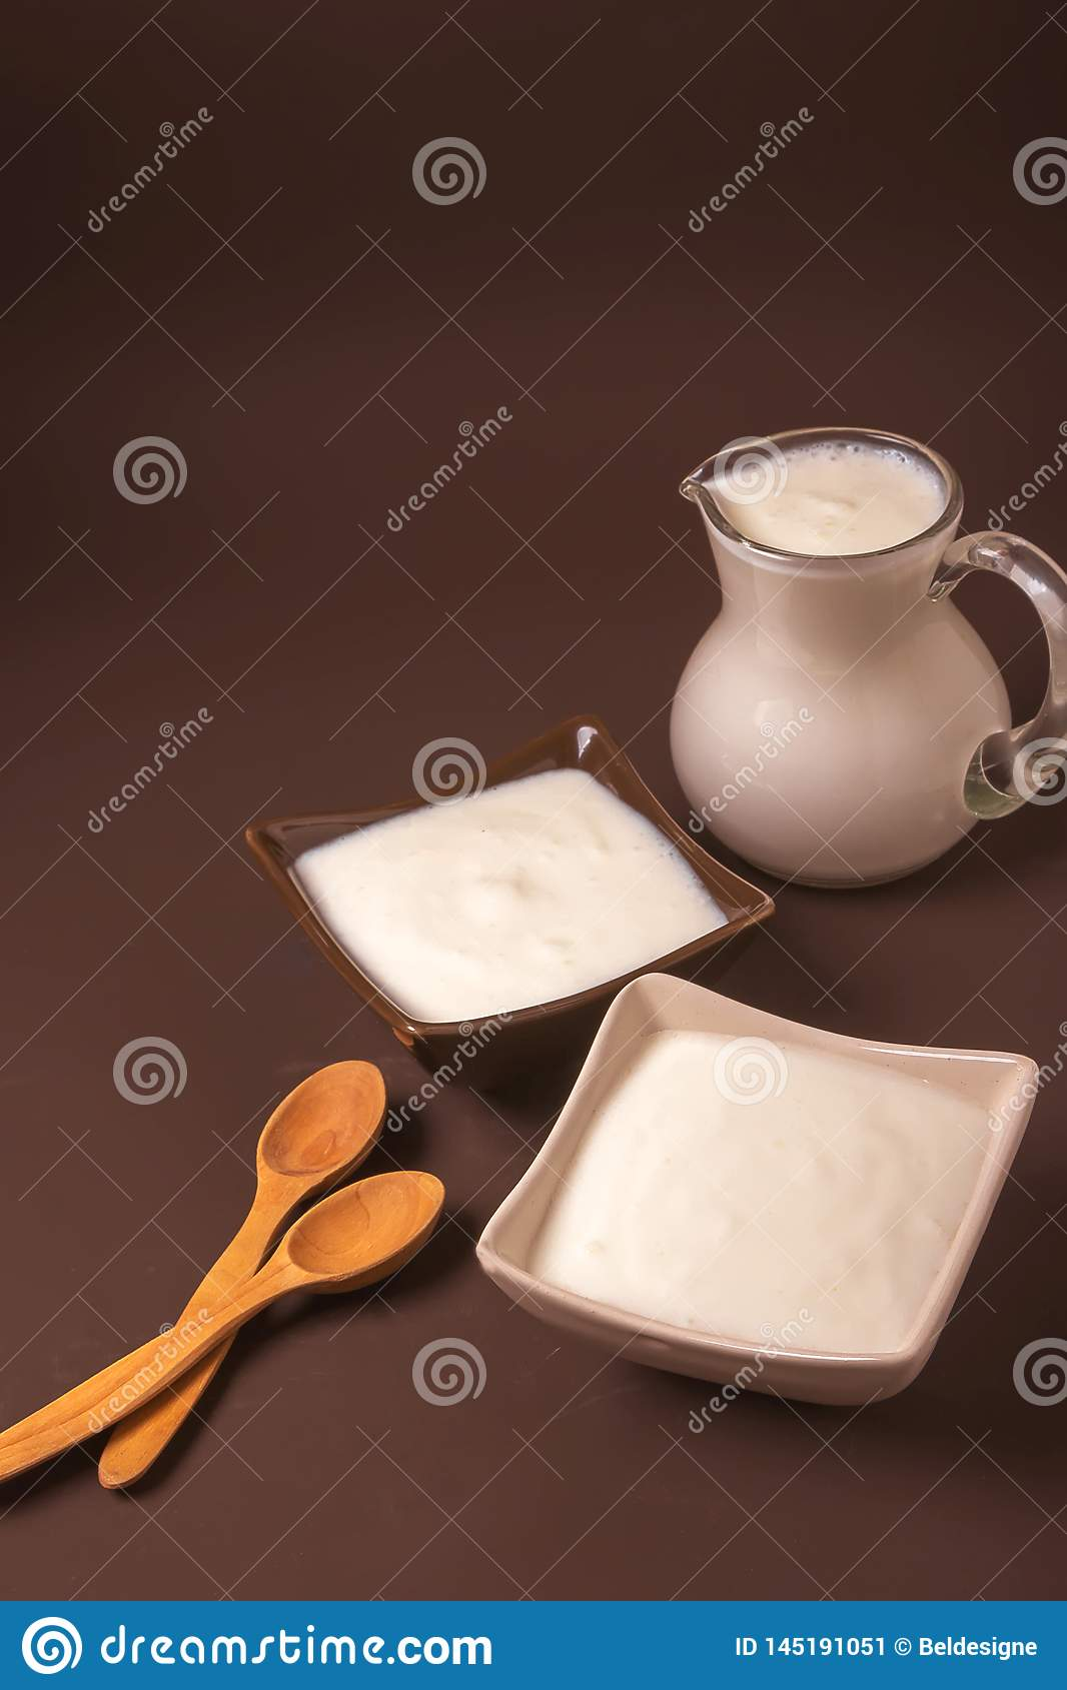 Homemade yogurt in ceramic square bowls, a jug brim full of yogurt behind the bowls. Healthy food from yogurt concept